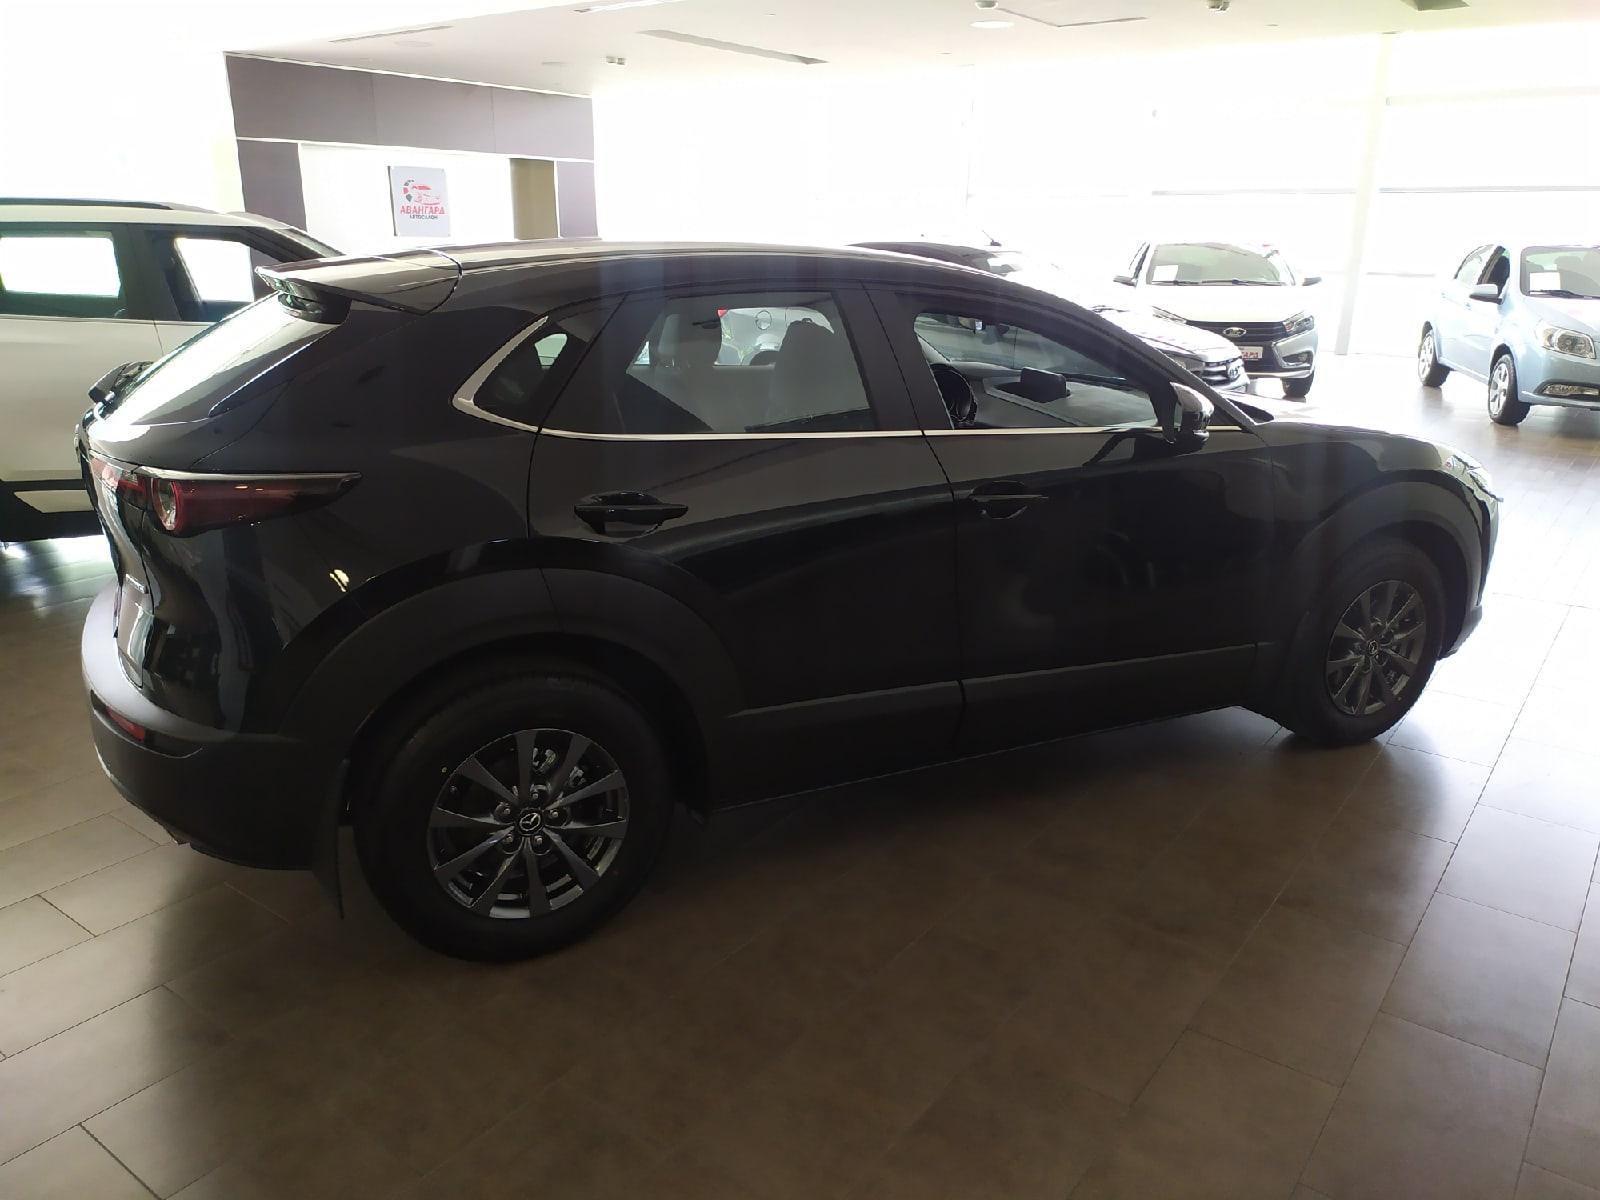 Mazda CX30 2.0 SKYACTIV-G 6 AT 2WD (150 л.с.), Active, чёрного цвета (Jet Black), 2021